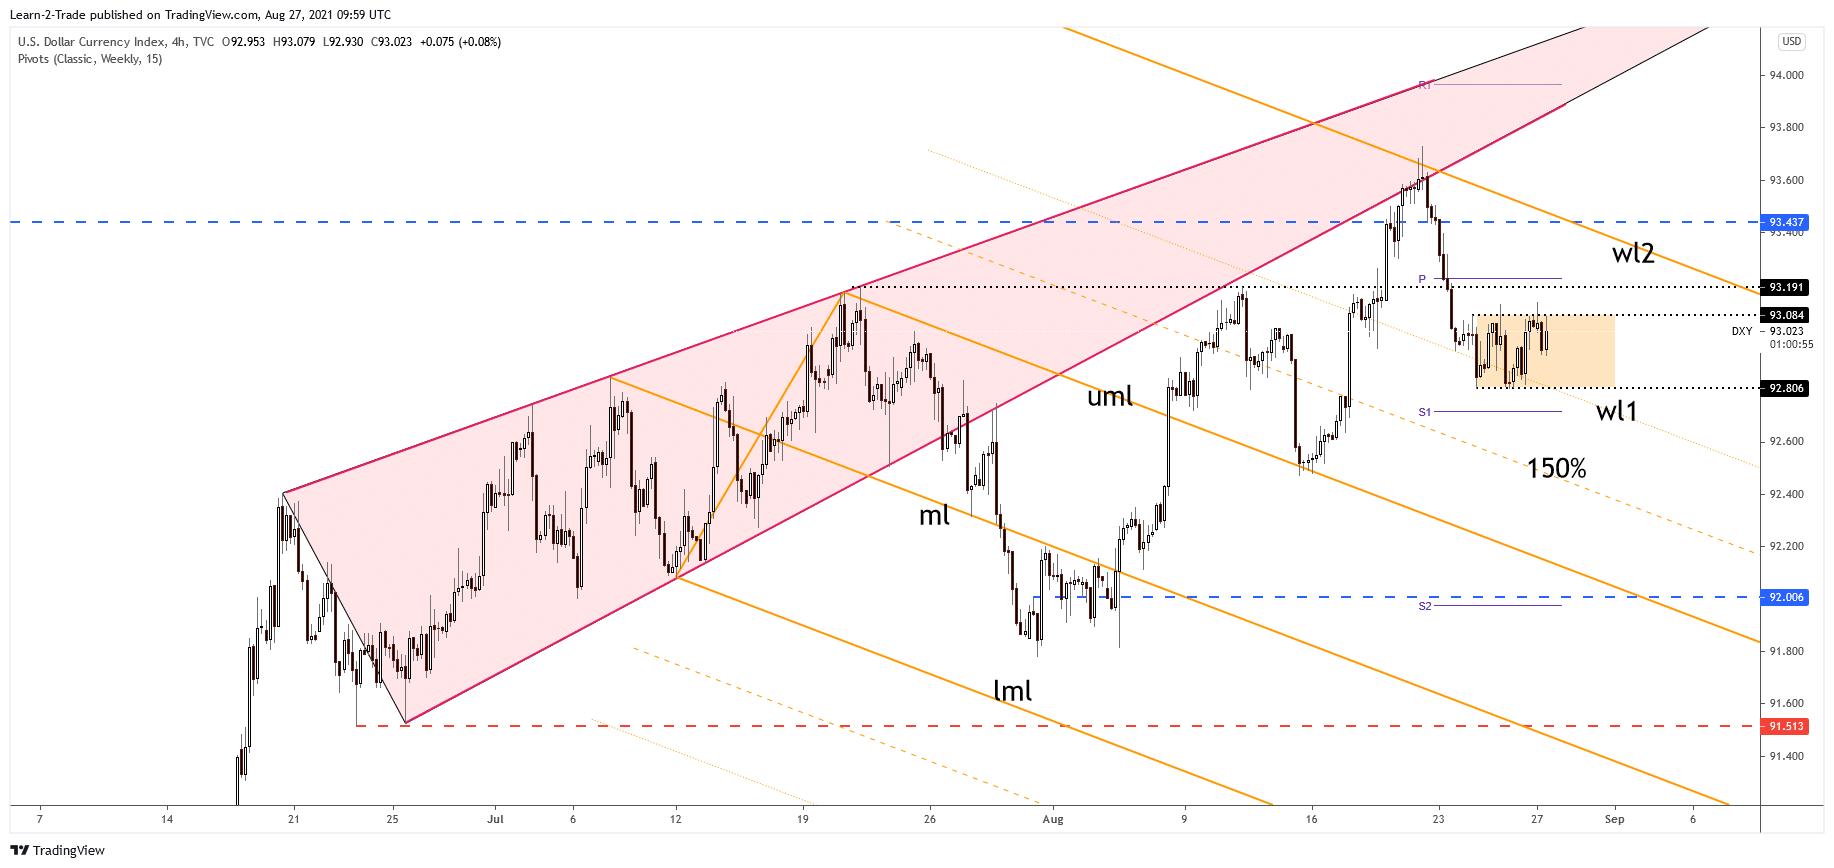 DXY Dolar index 4-hour price chart